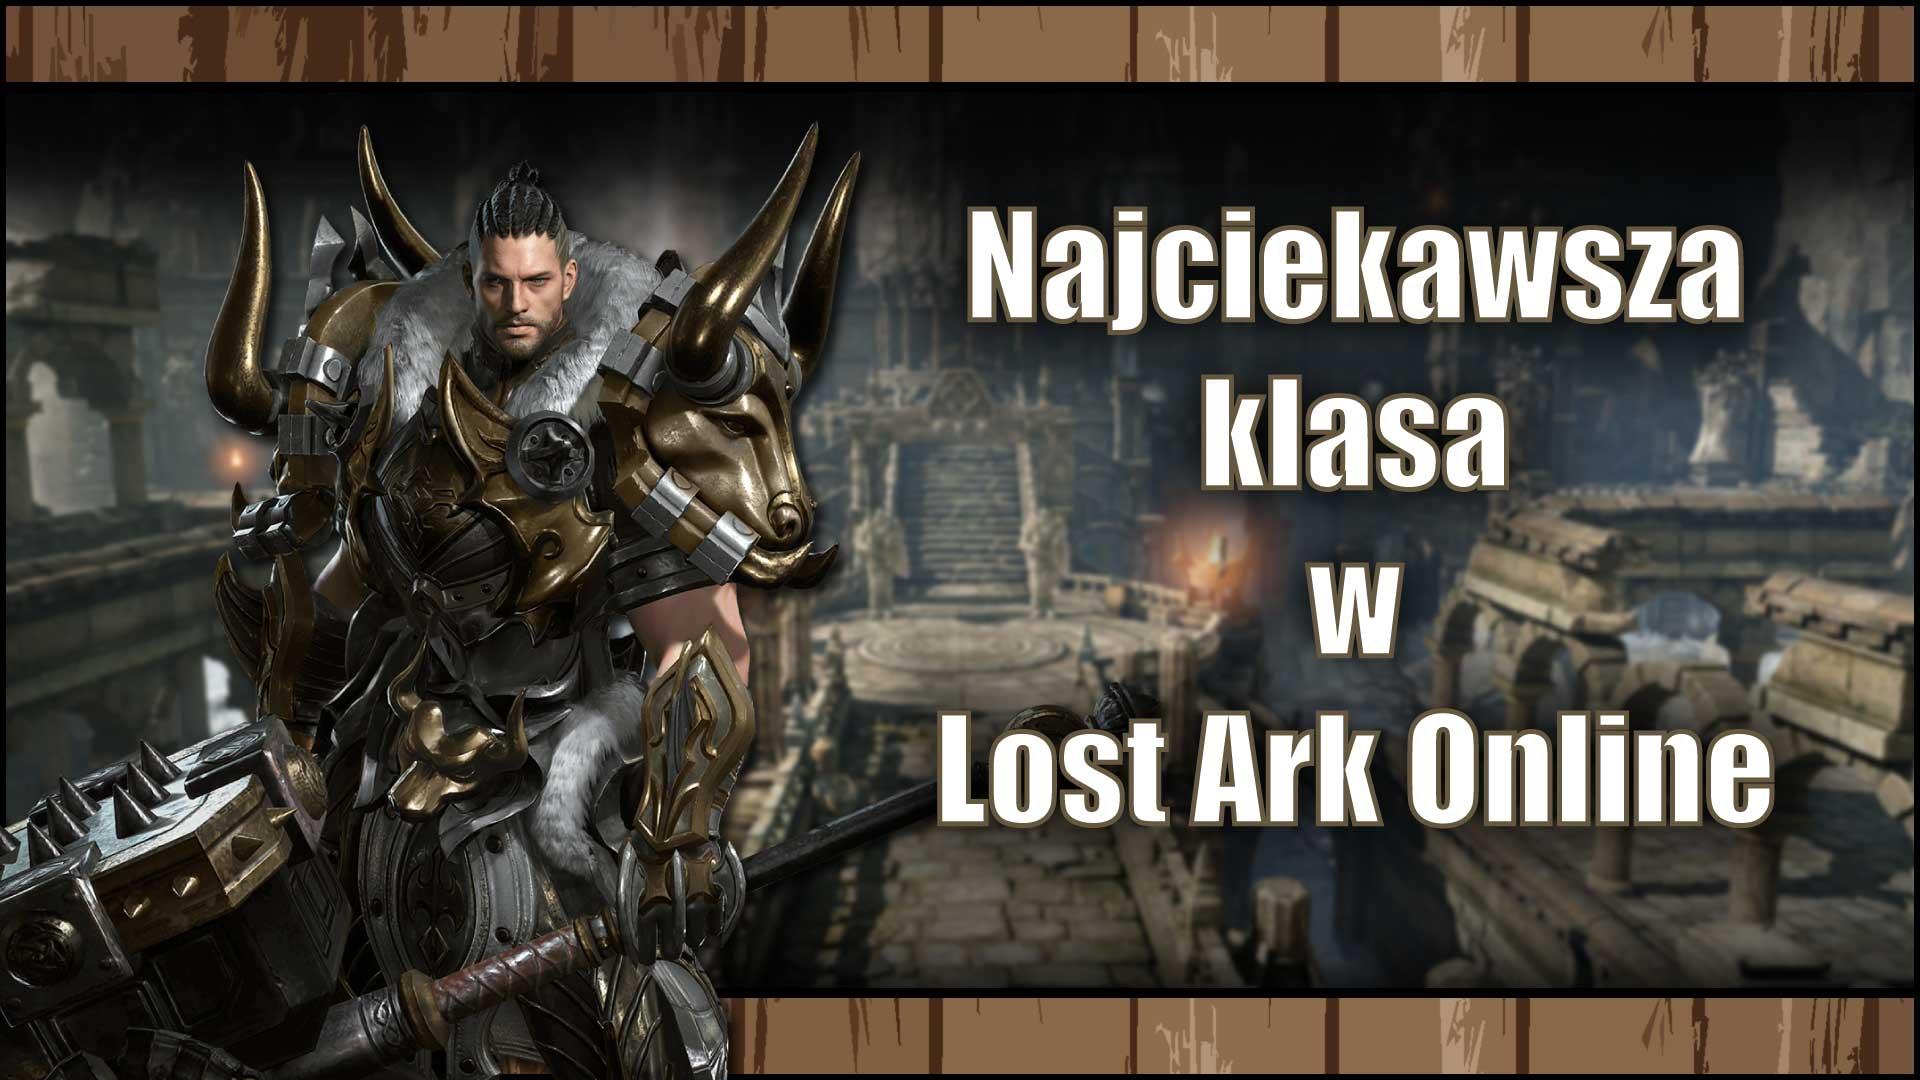 Lost Ark Online – Najciekawsza klasa postaci